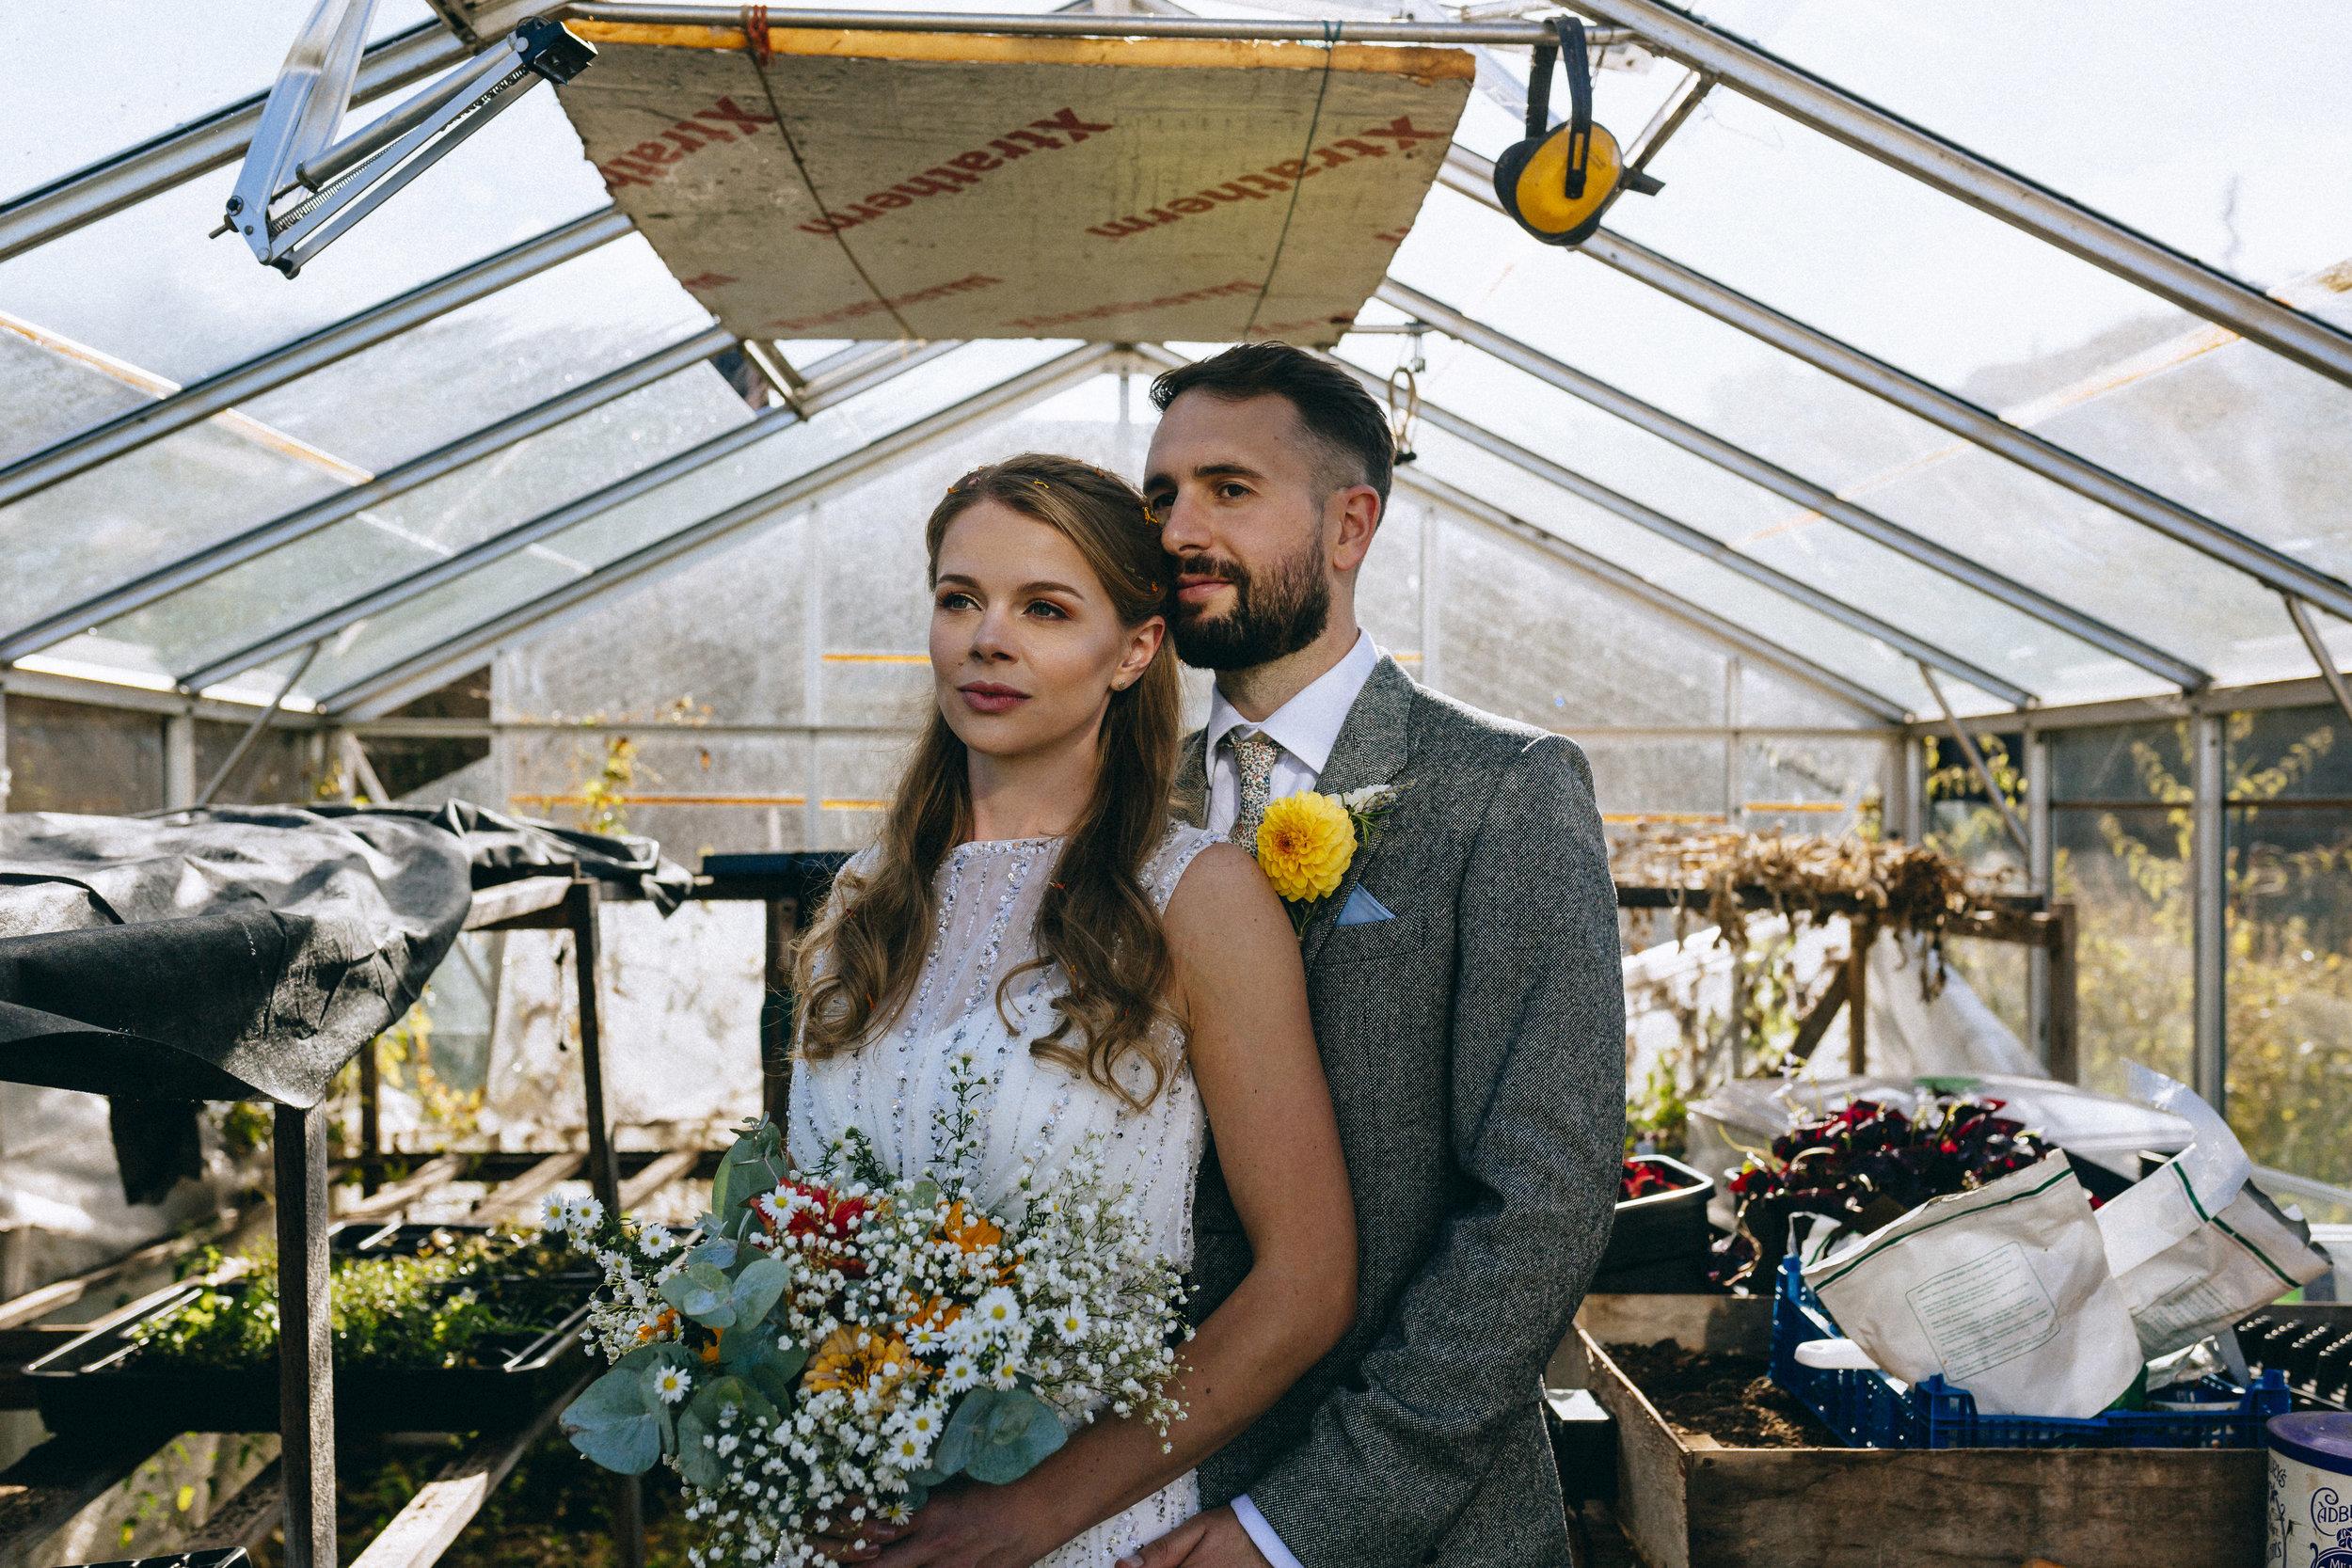 wedding photography birmingham.jpg